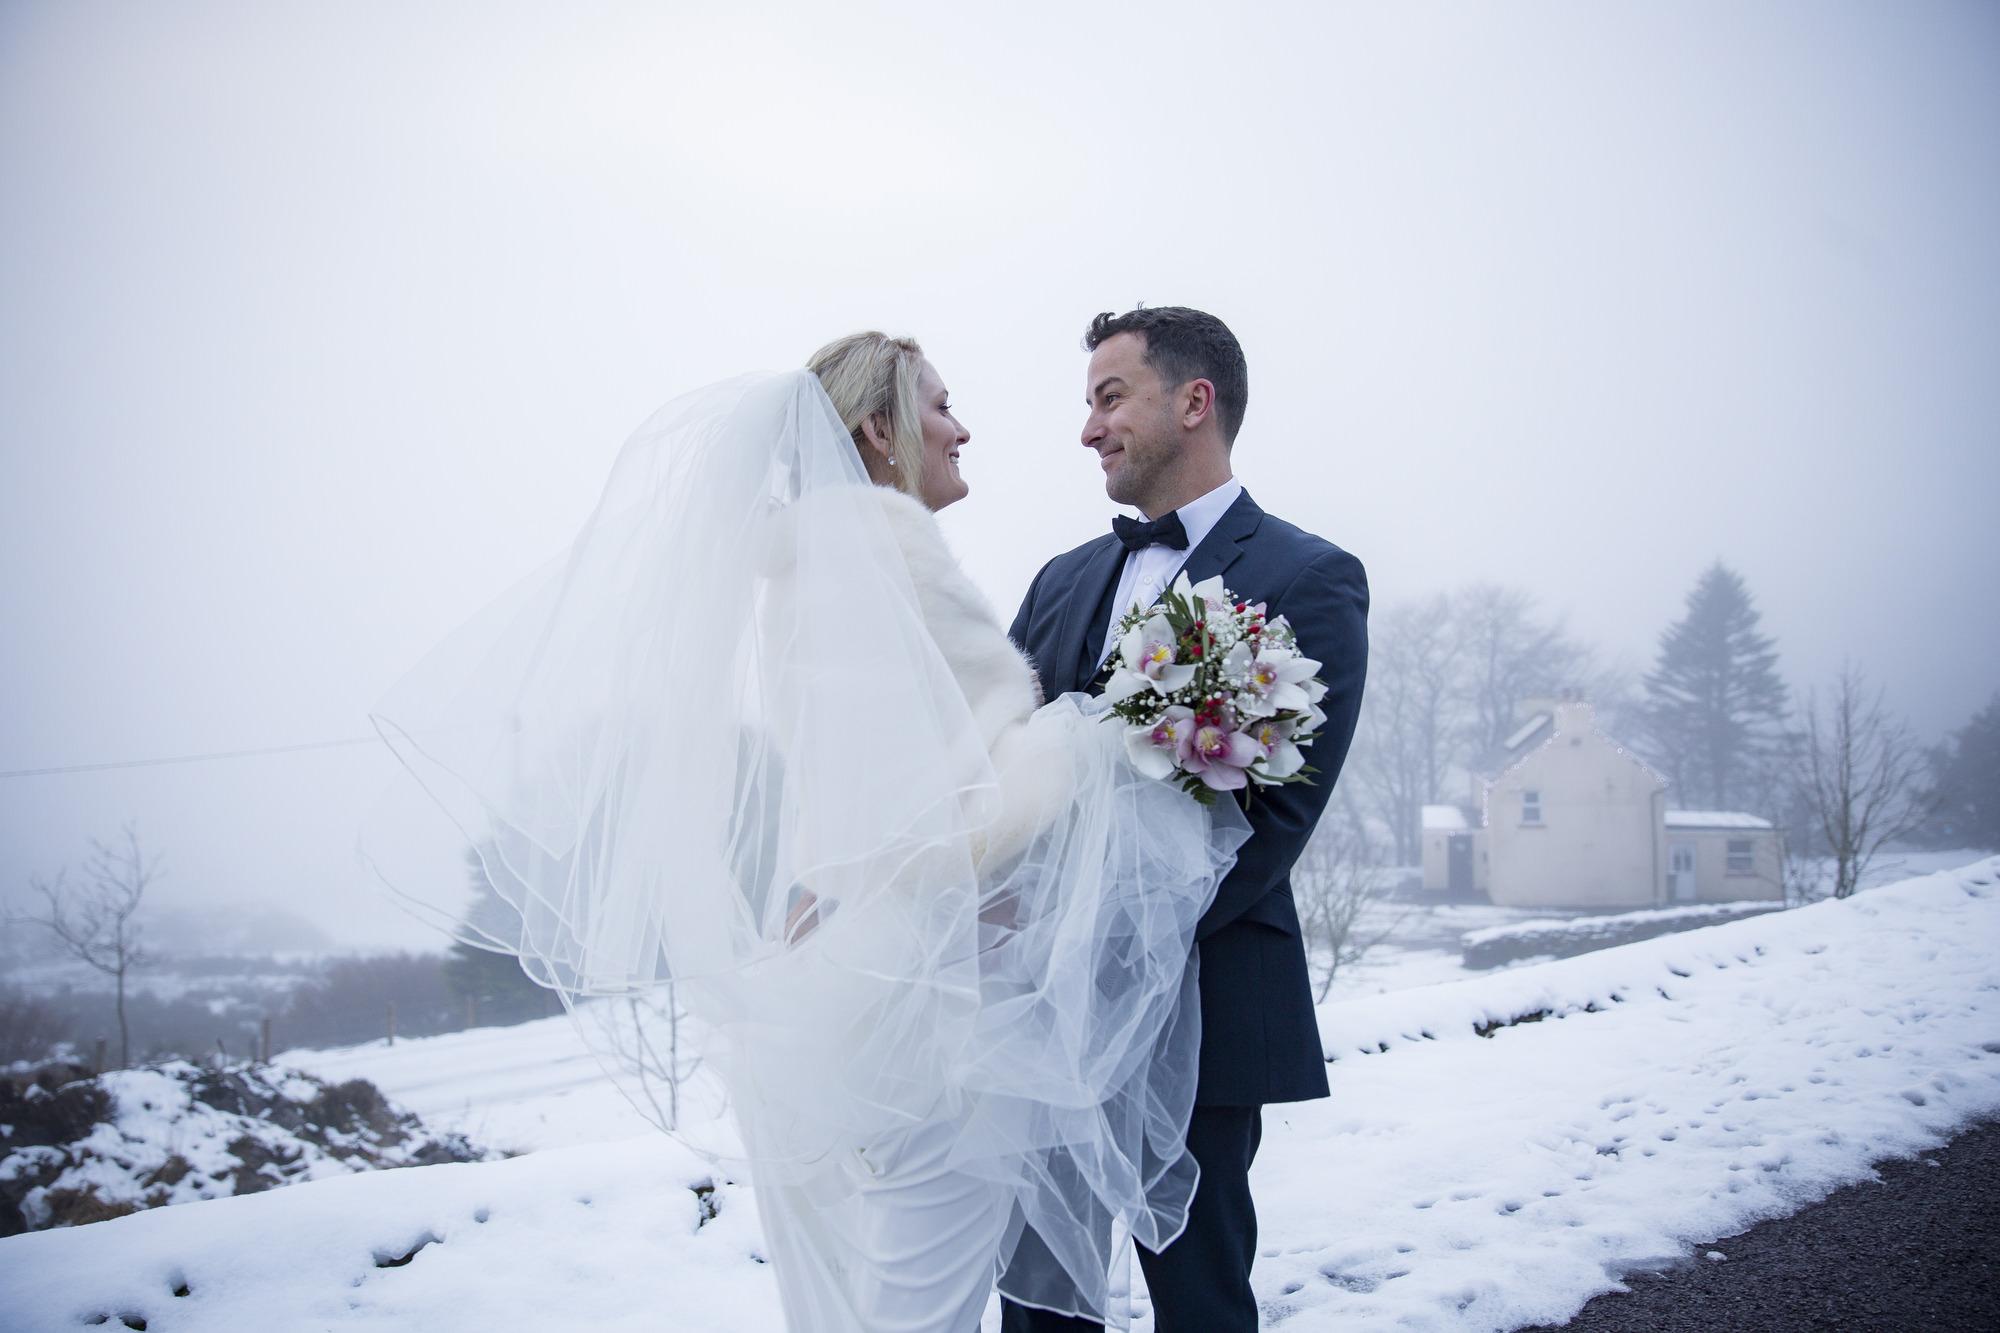 muckross_park_hotel_grougane_barra_wedding_photographer_goldenmoments_057.jpg